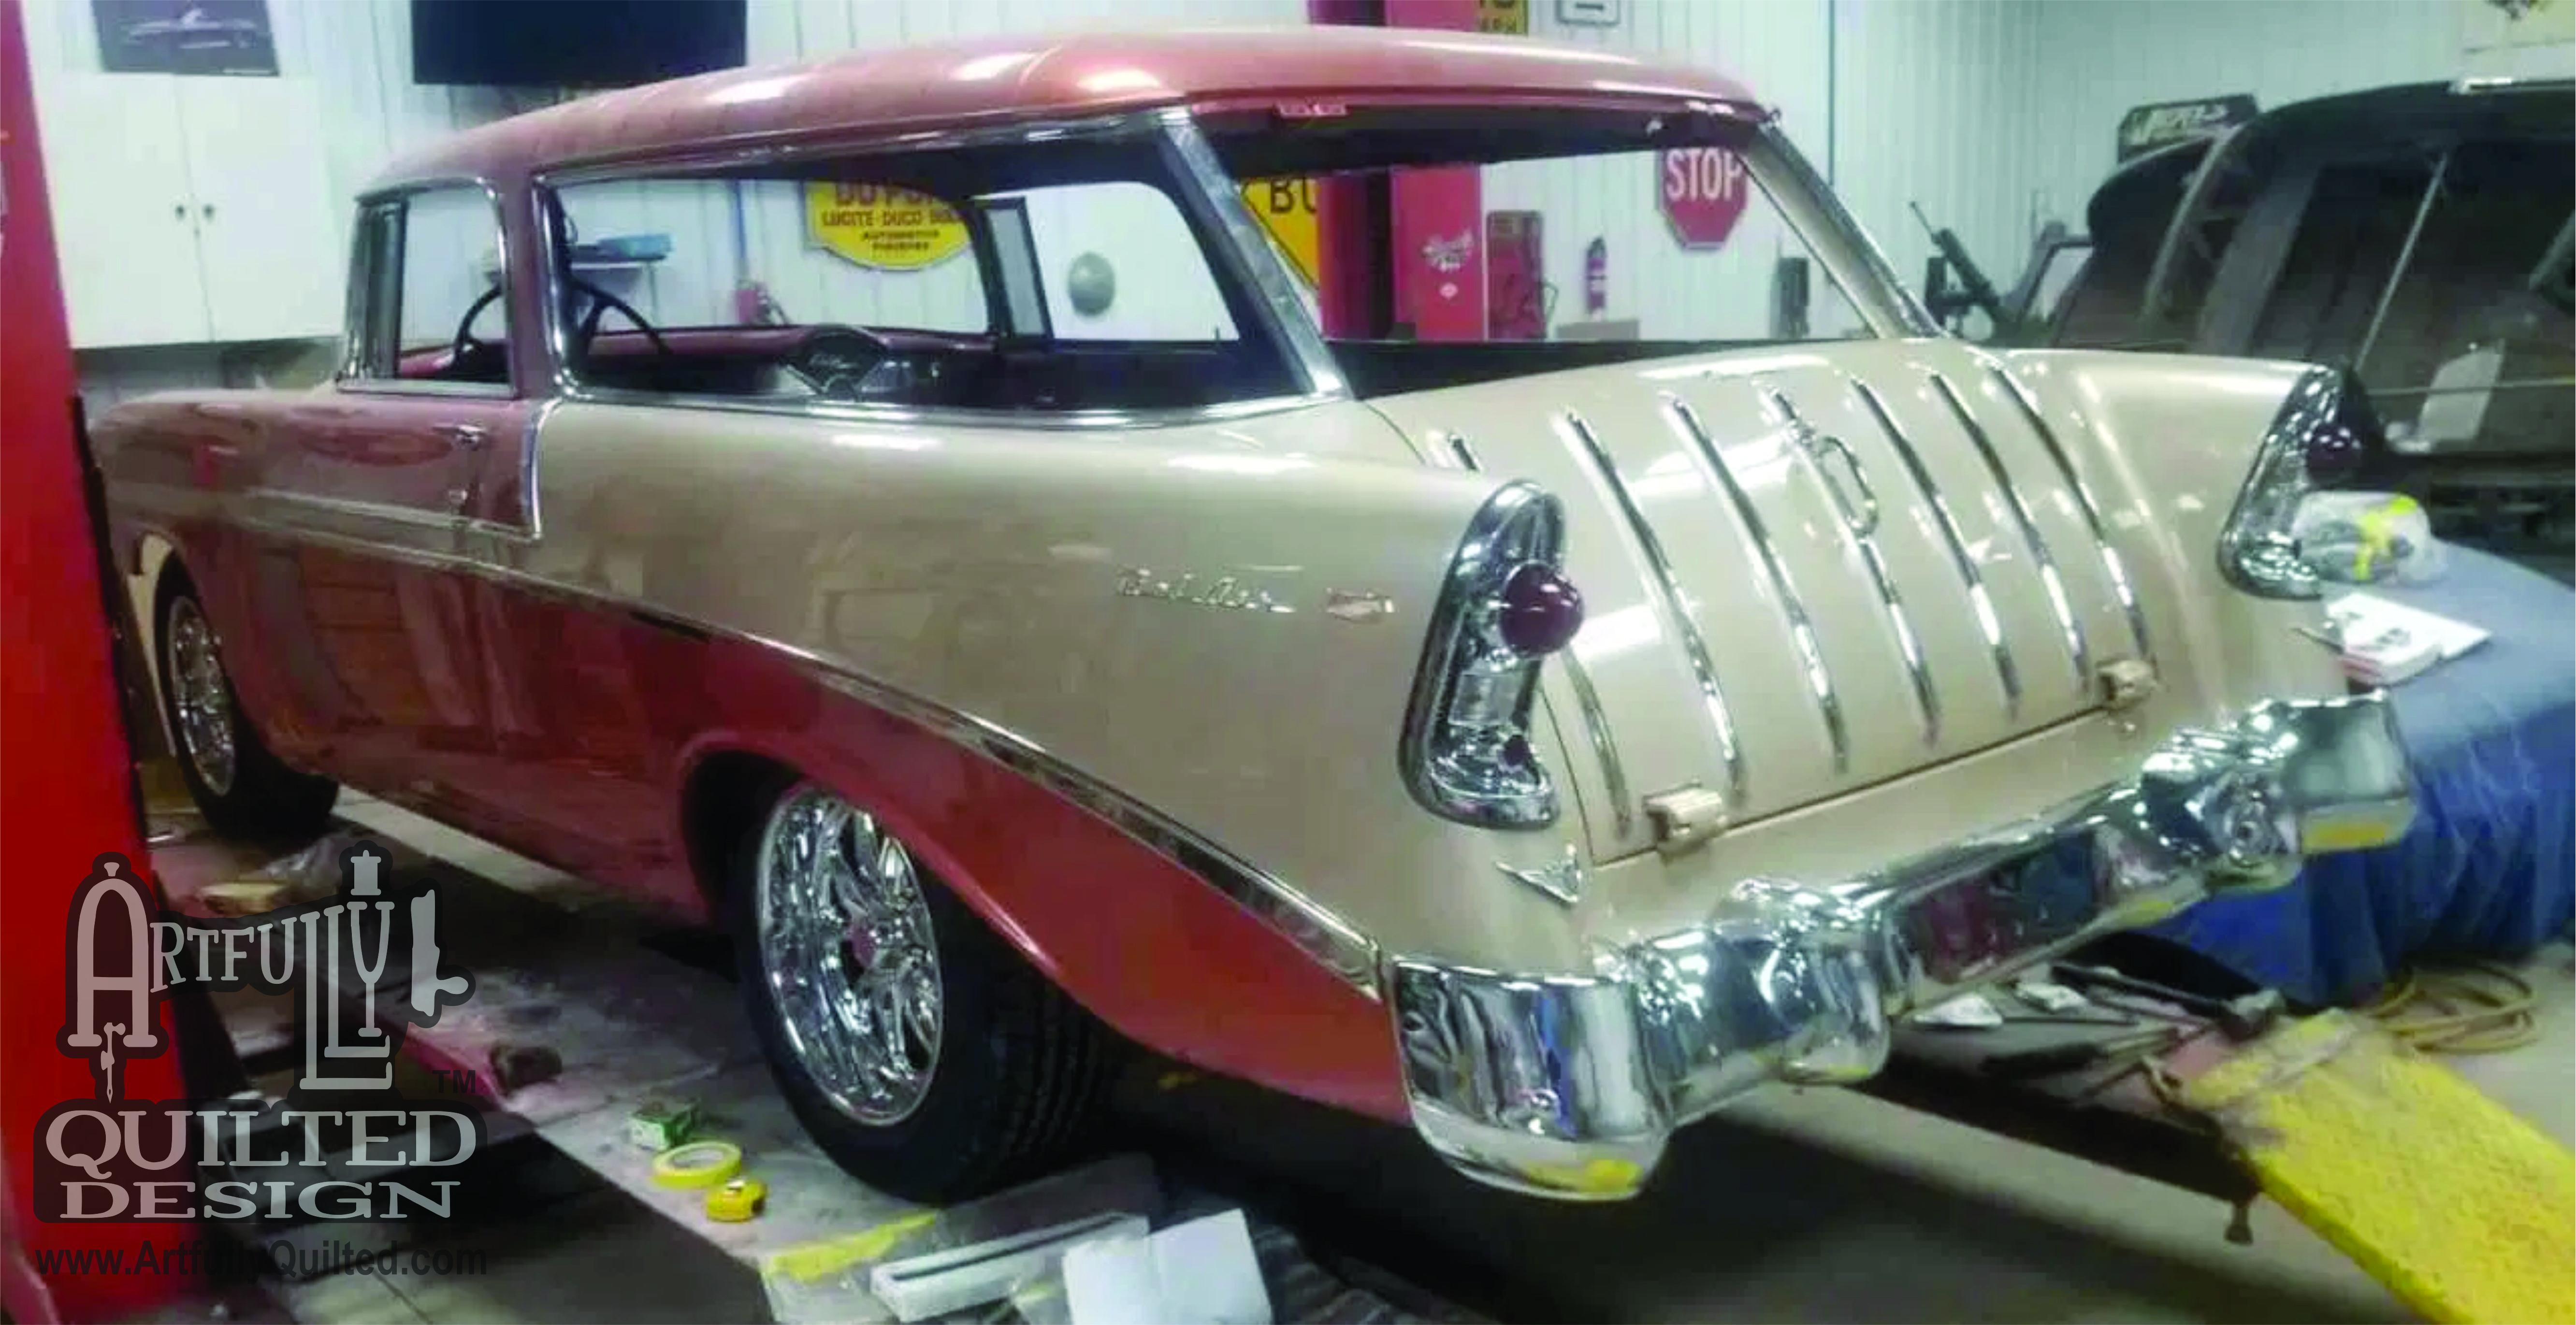 1956 Chevrolet Nomad Bel Air After Bill's Magic.